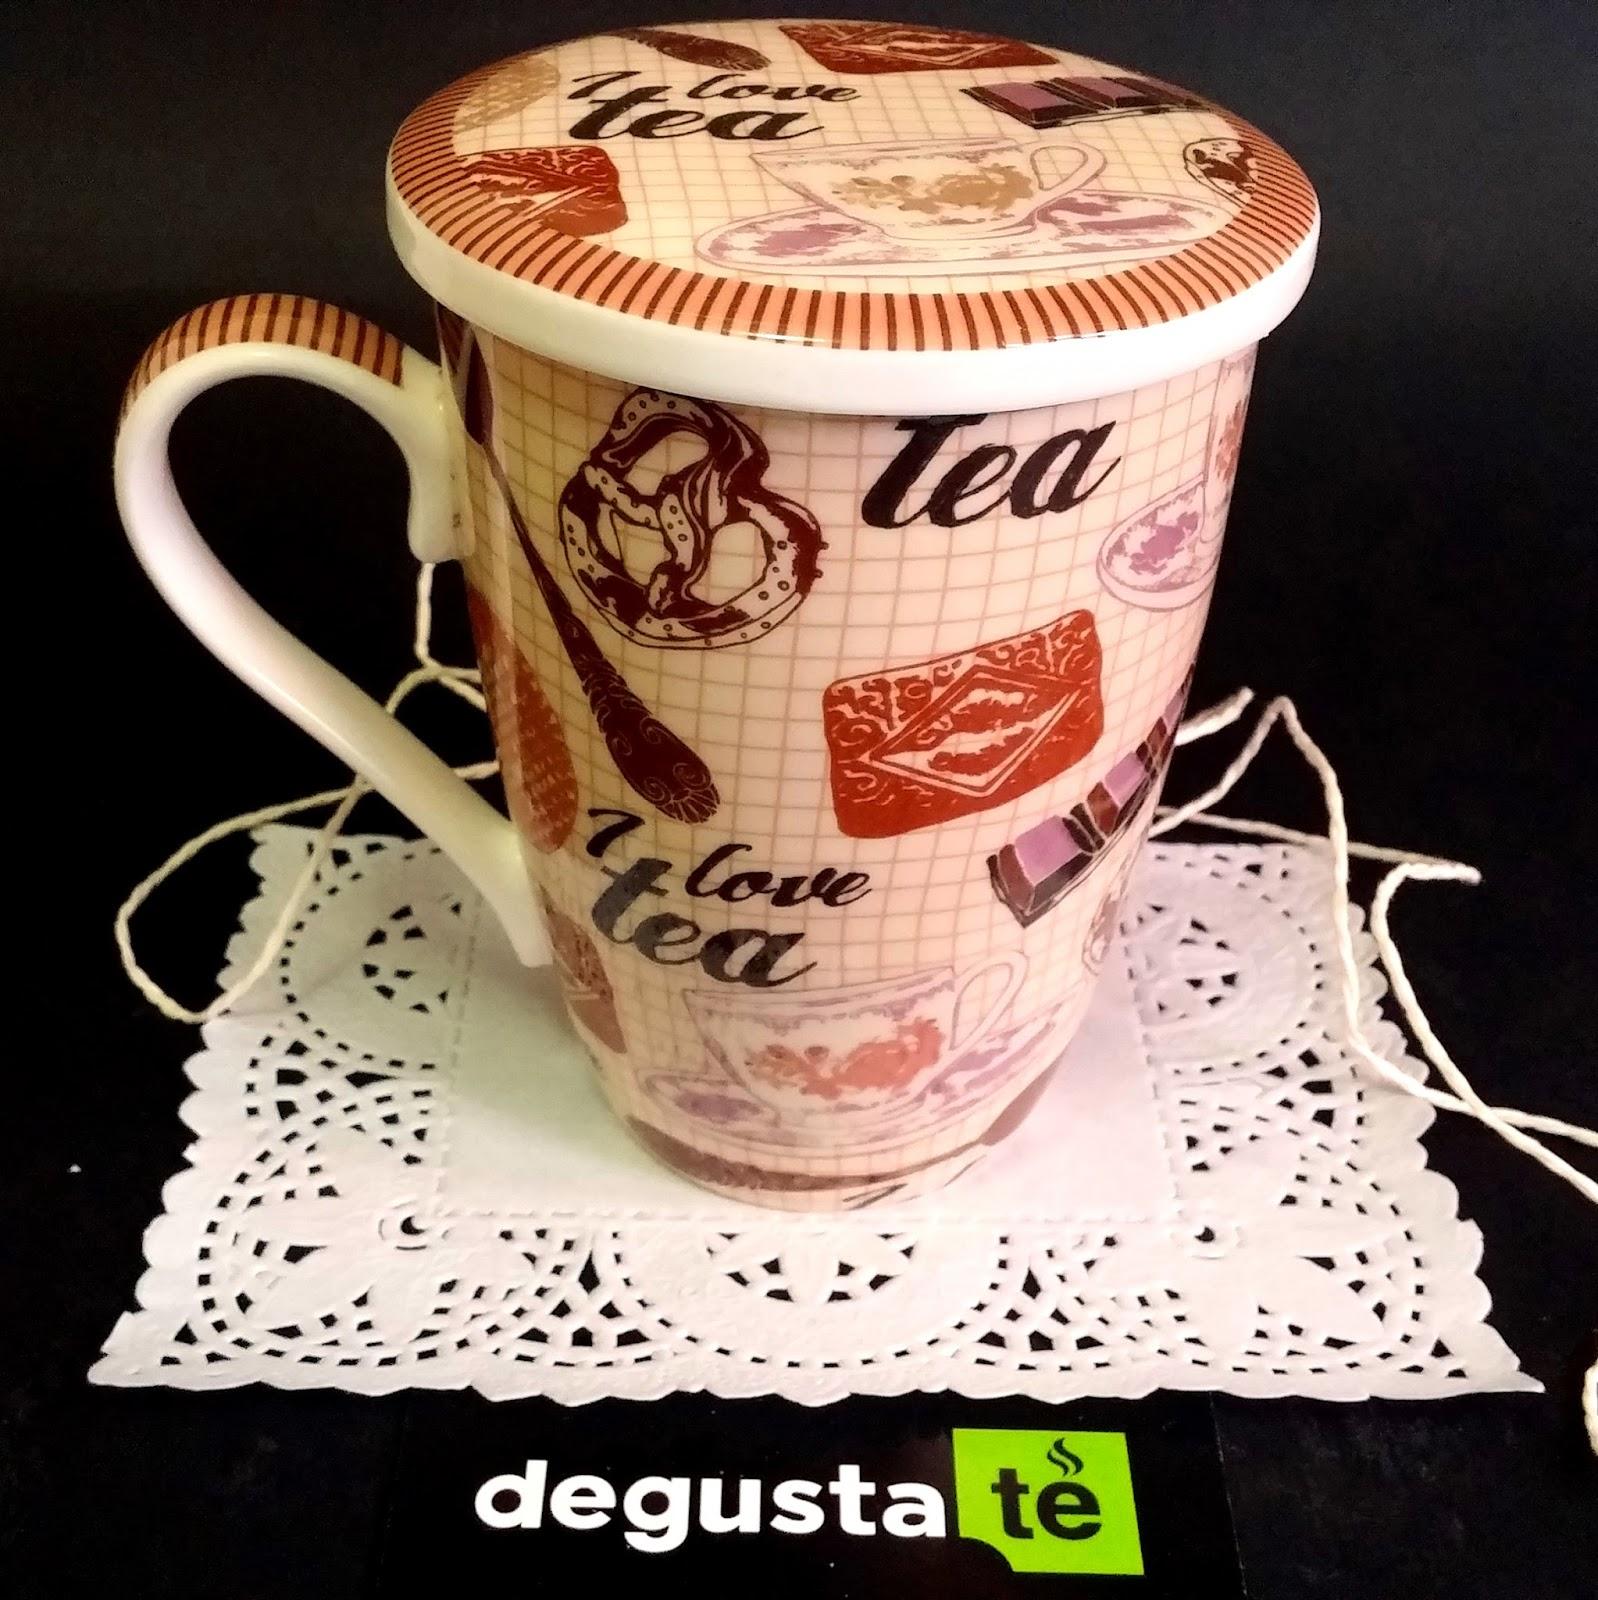 Club degustat tazas para t con filtro for Tazas para te